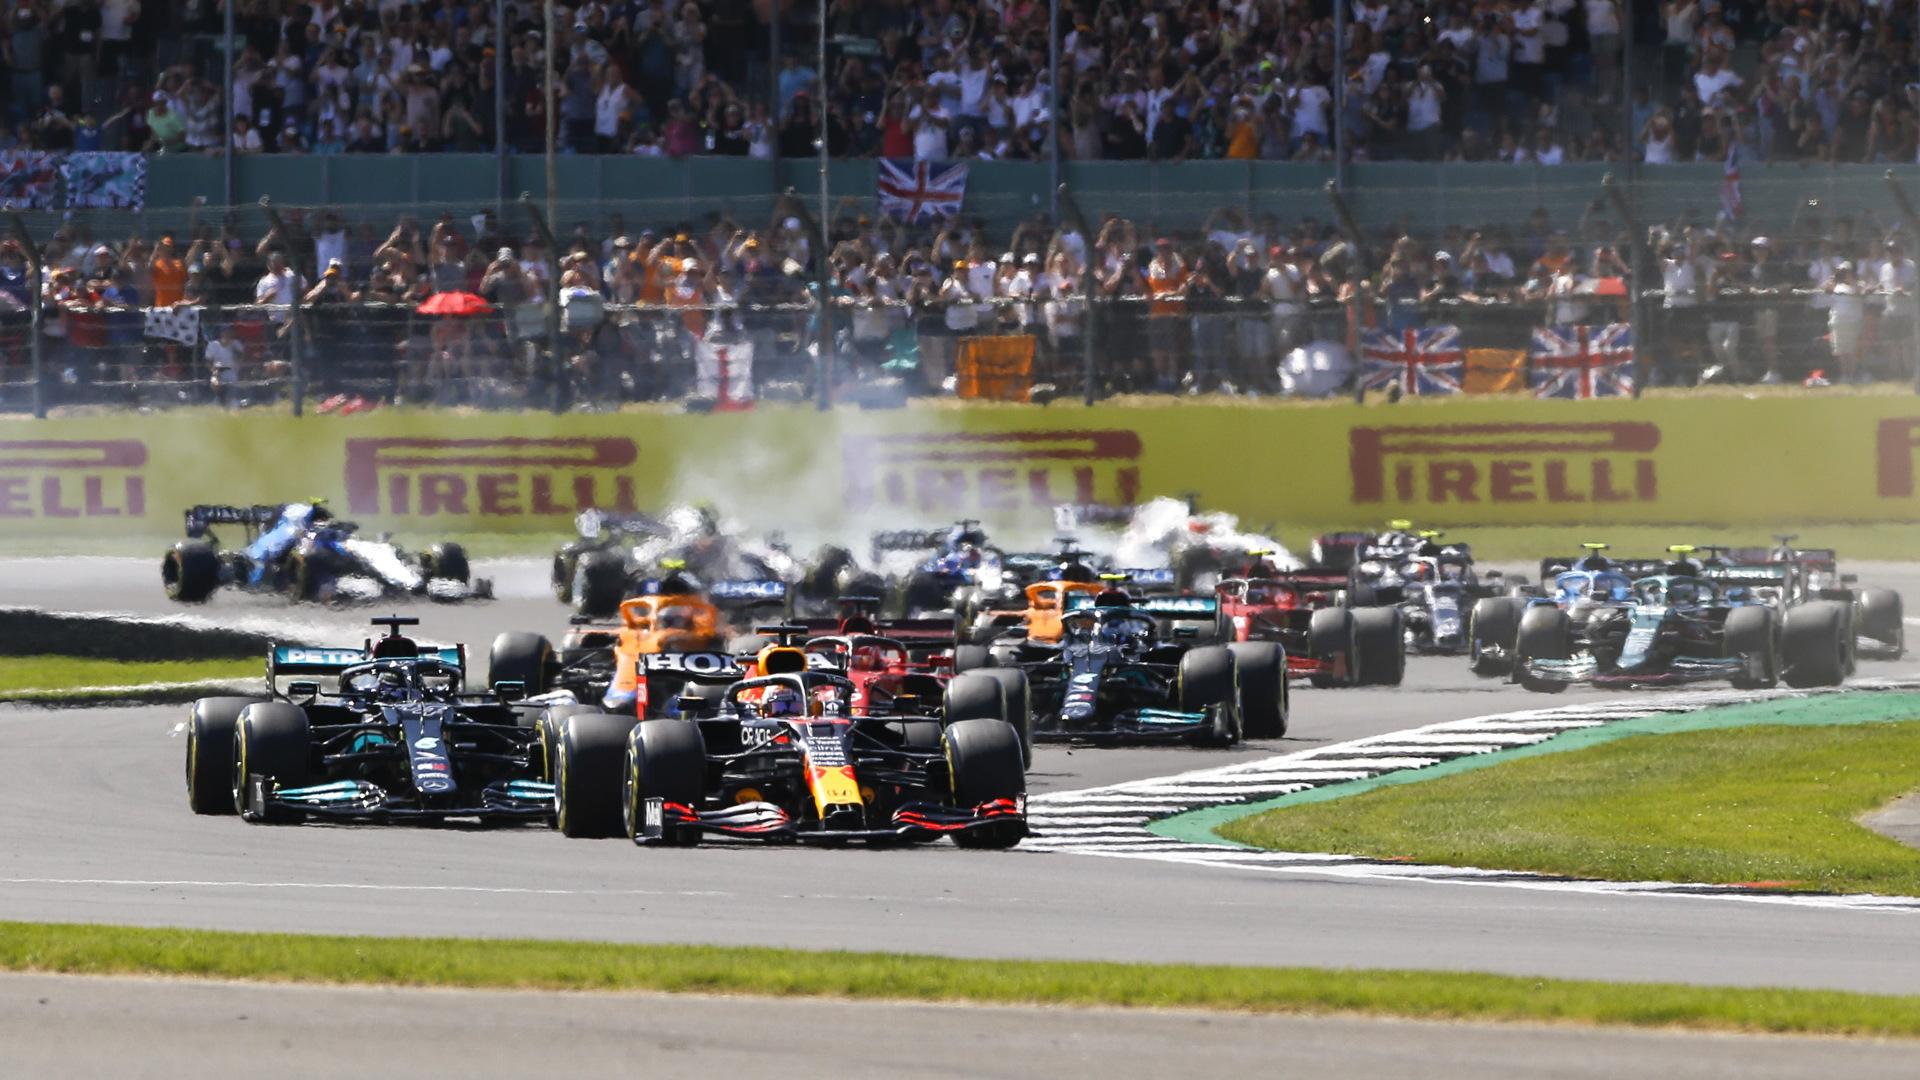 2021 Formula One British Grand Prix